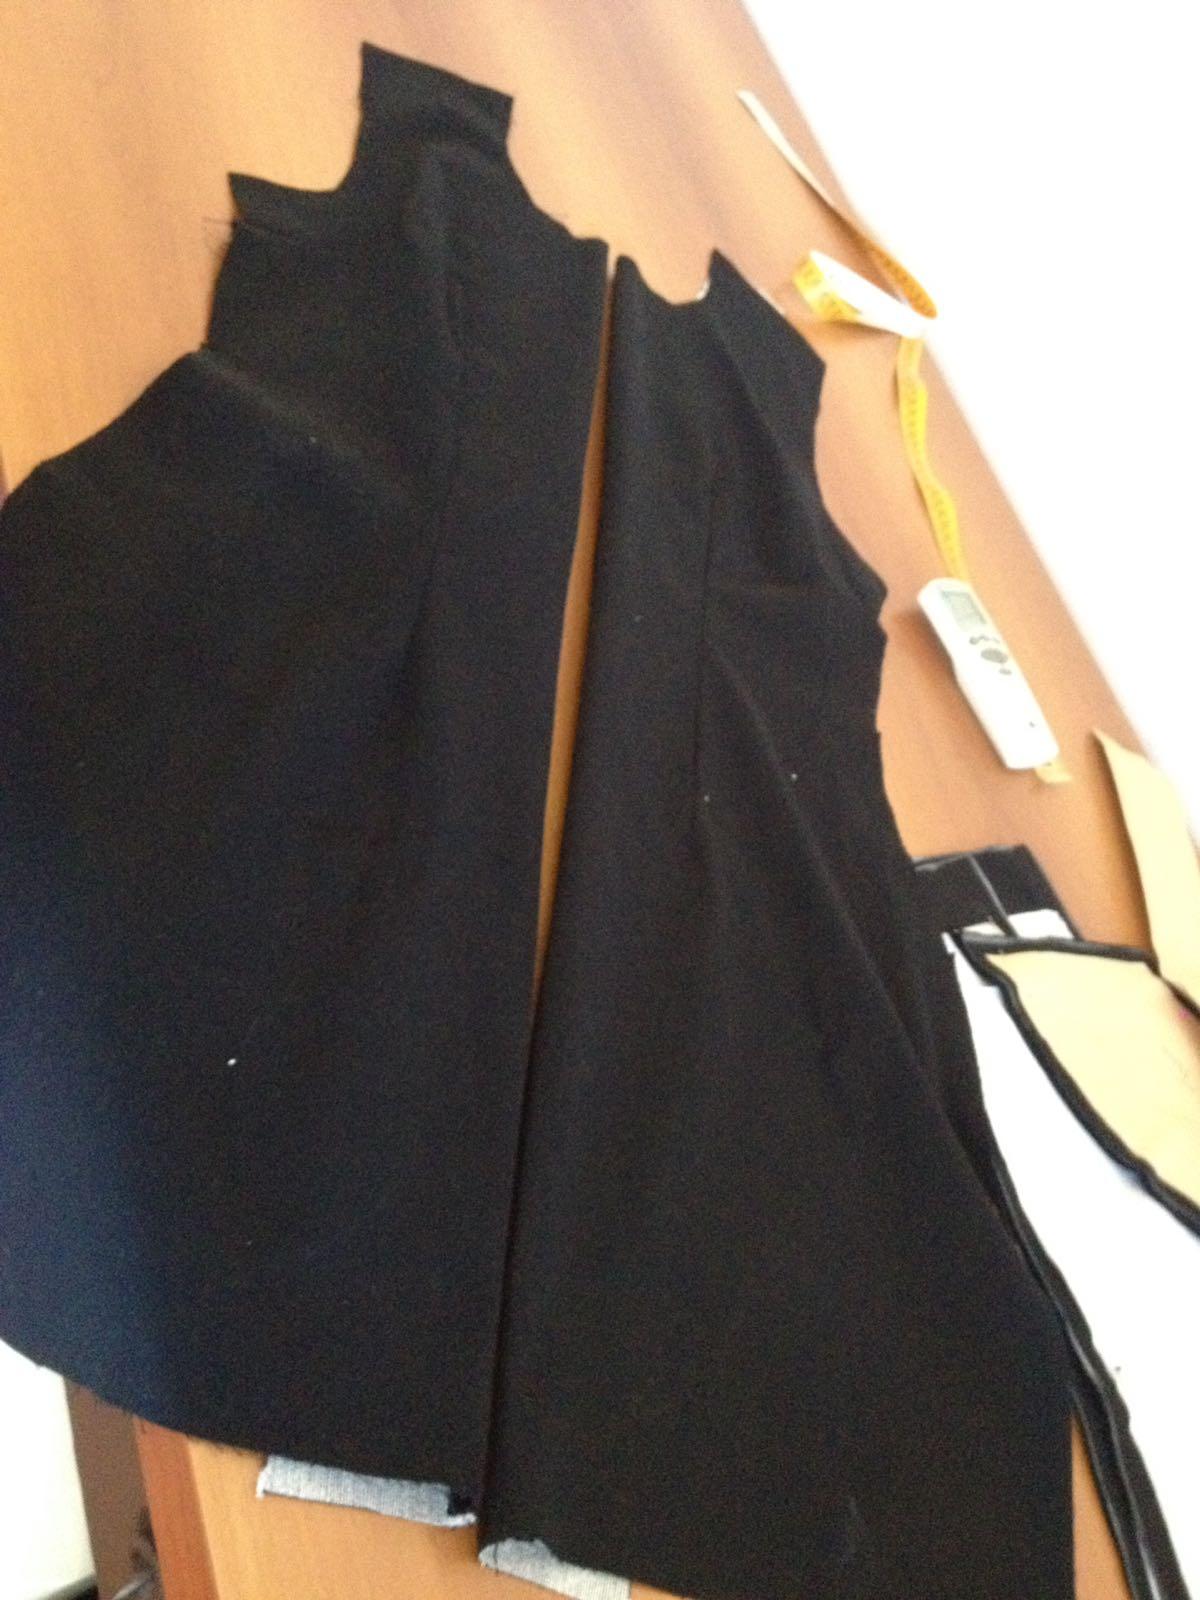 Novice Designer Jacket